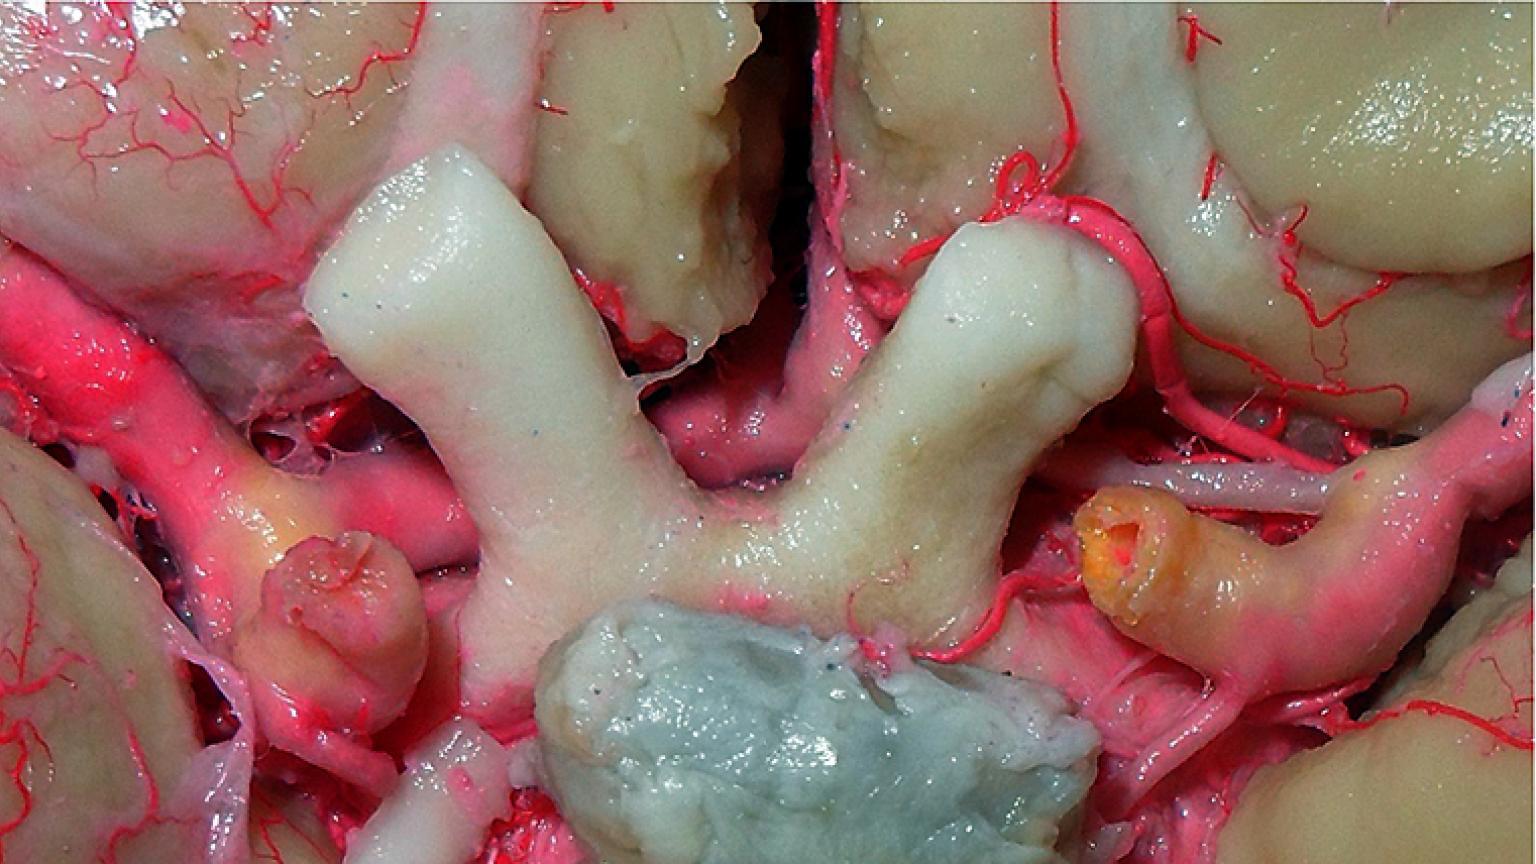 optic chiasm hypophysis willis